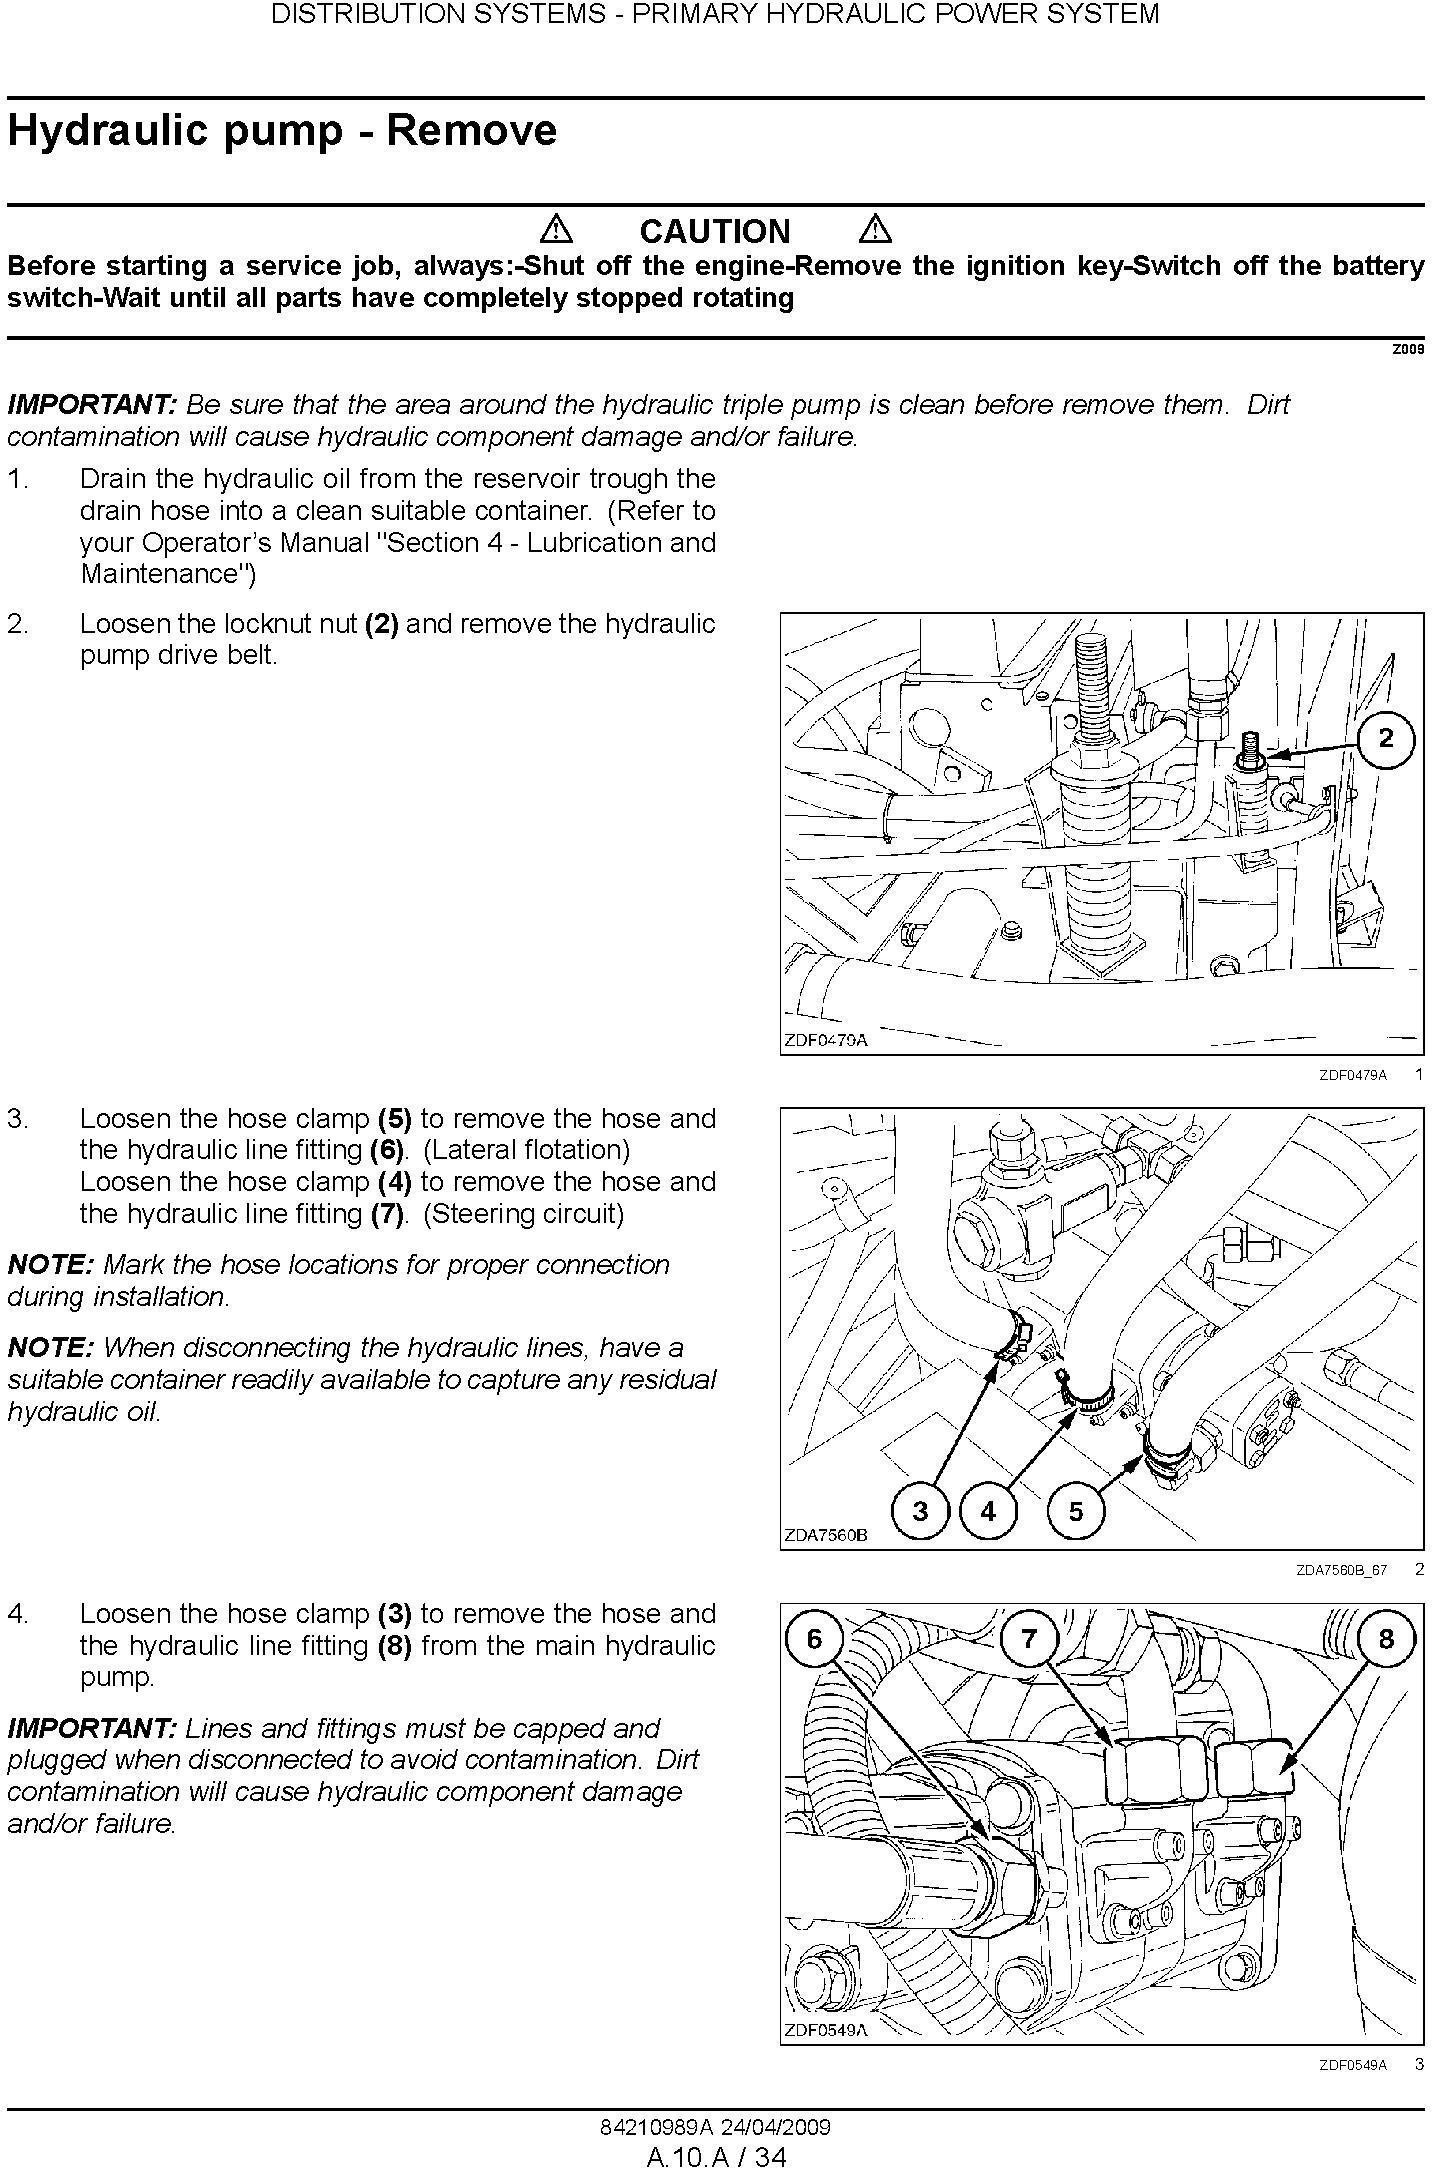 New Holland CSX7040, CSX7050, CSX7060, CSX7070, CSX7080 Combine Service Manual - 3